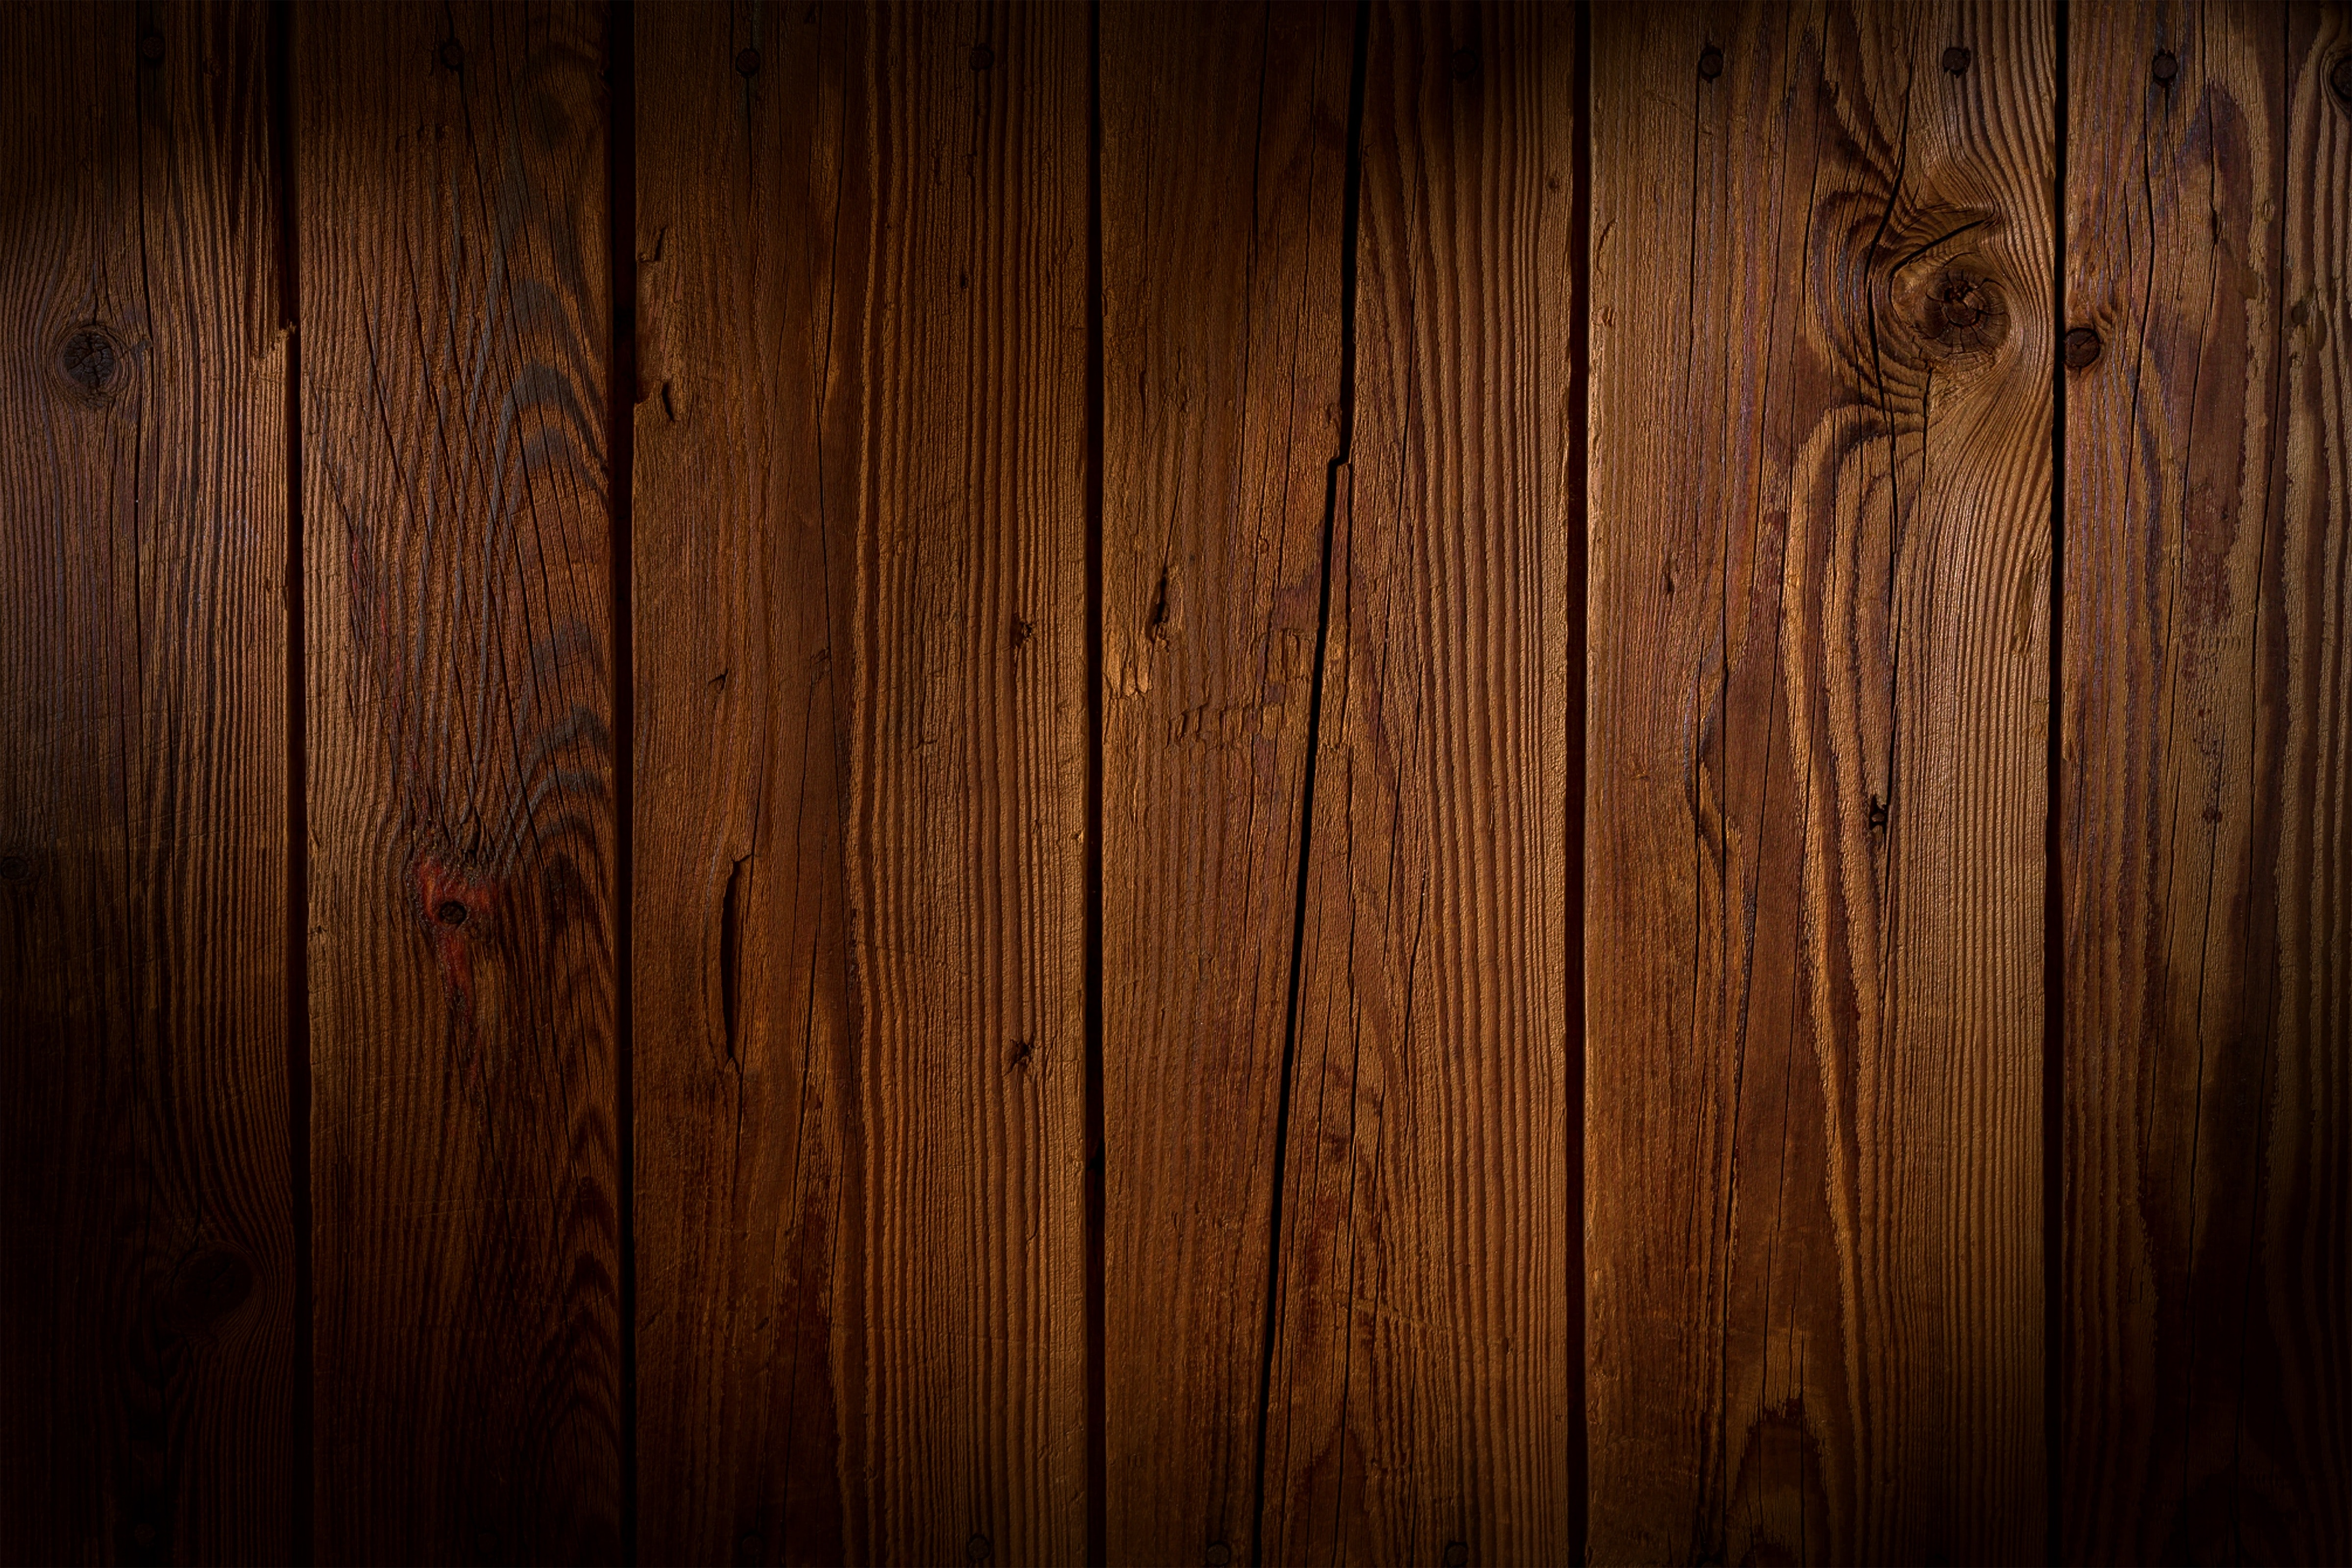 Macro shot of wooden planks photo